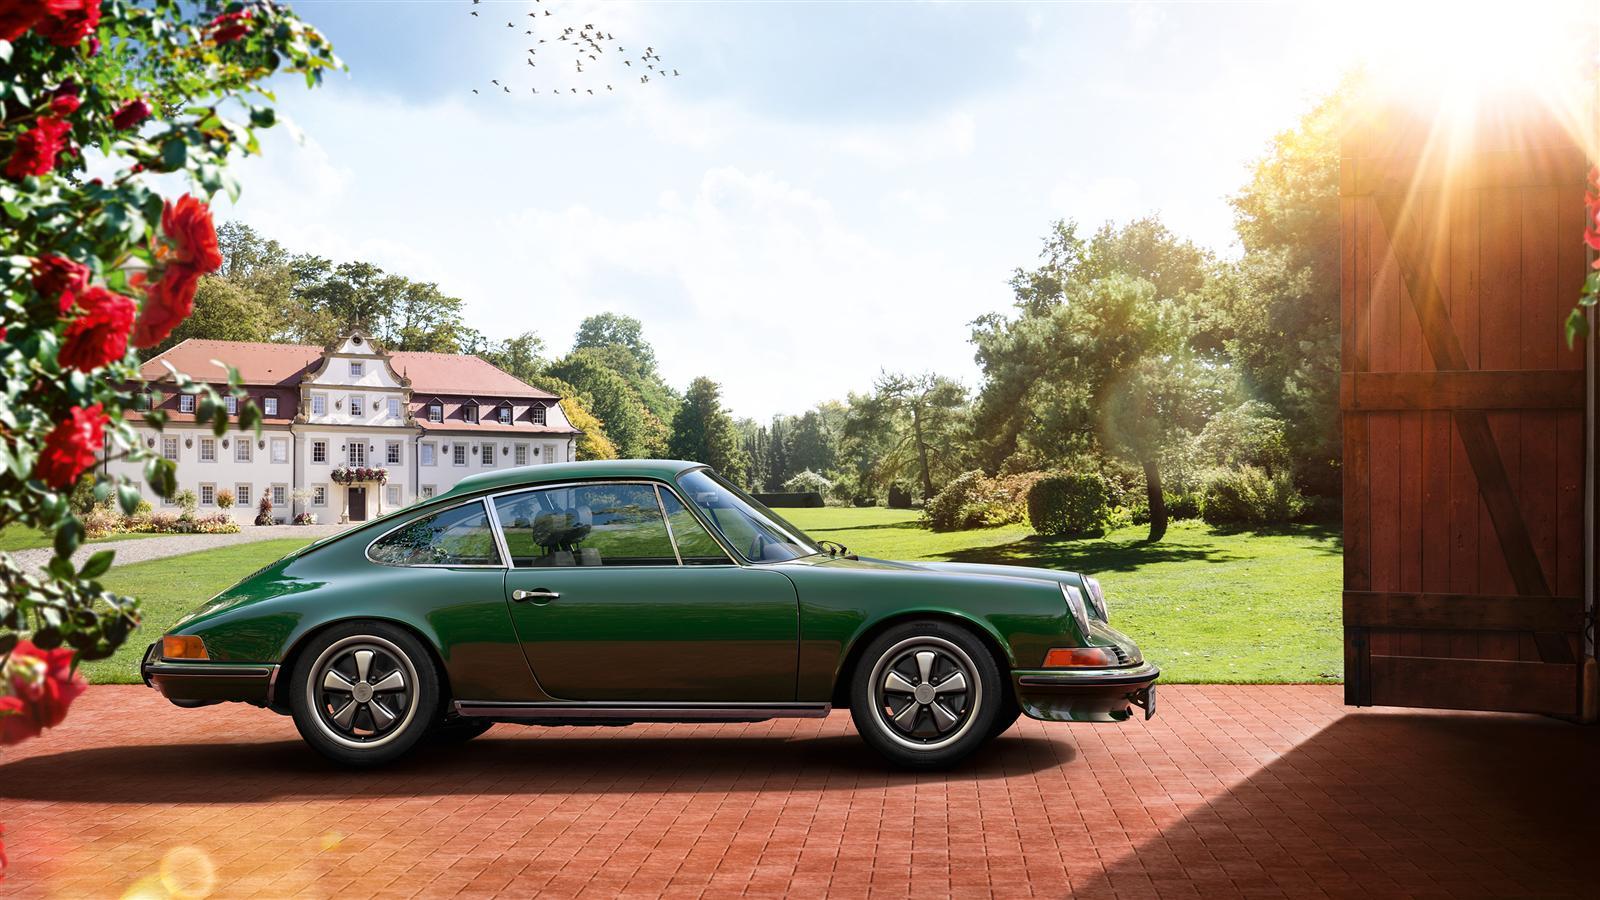 Porsche Gallery Porsche Cars North America